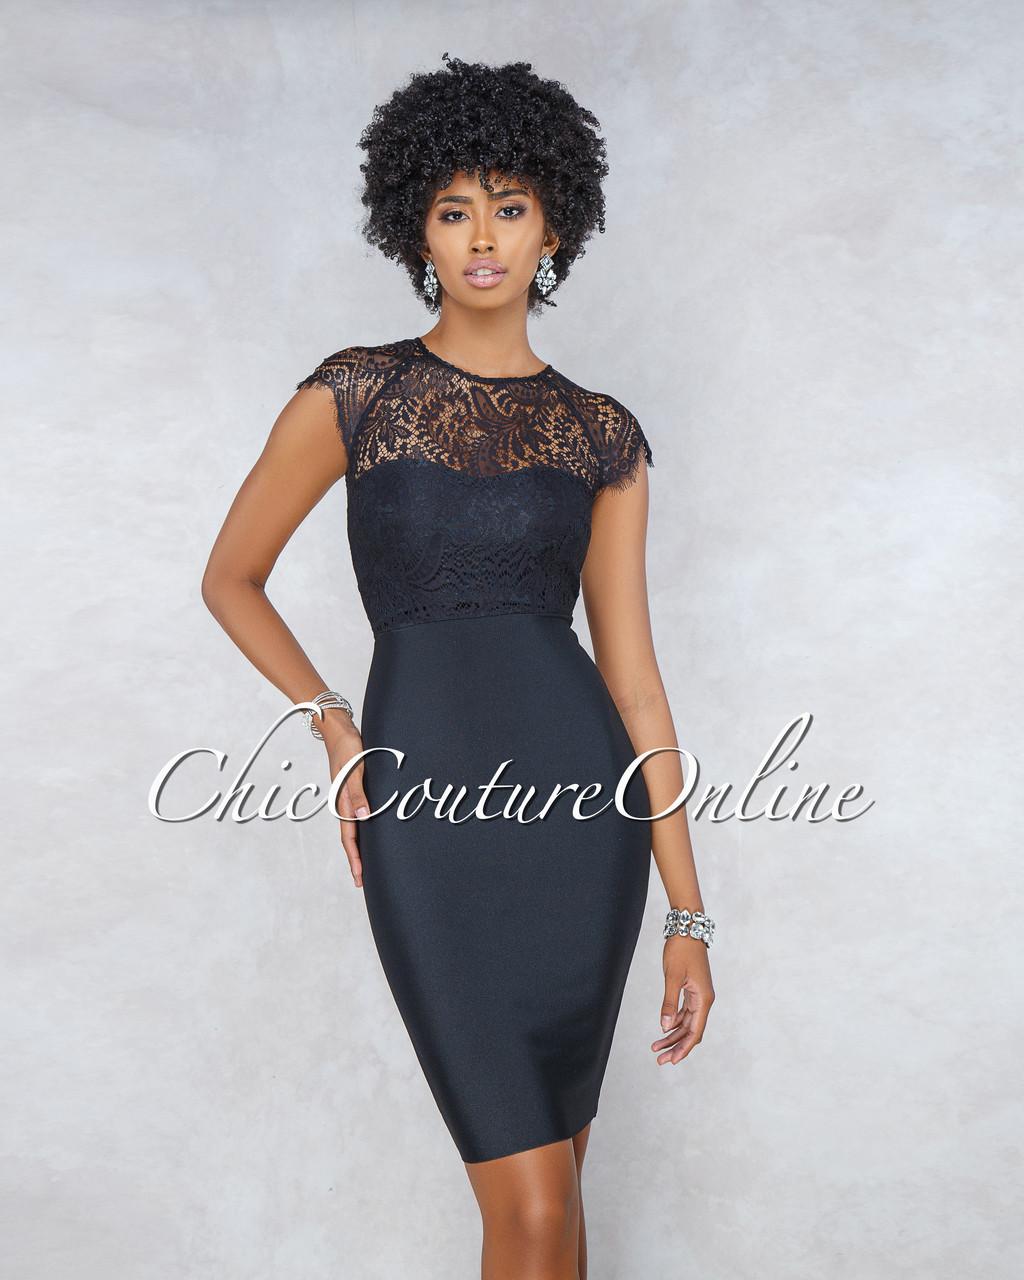 ae889a26d5ff Randie Black Lace Top Bandage Midi Dress. Price   90.00. Image 1